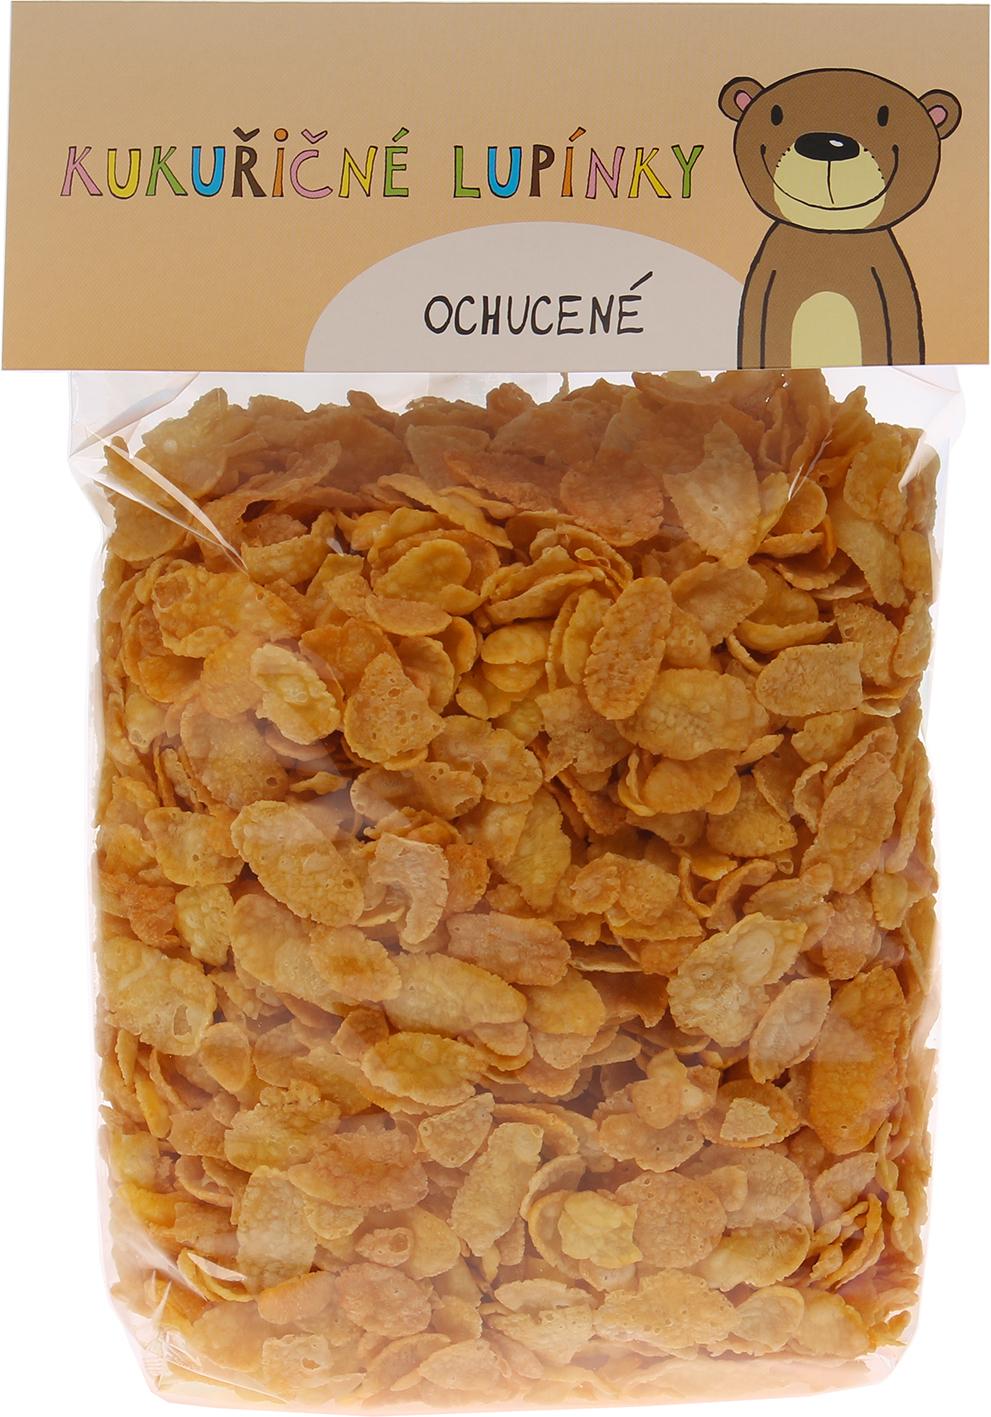 Bio kukuřičné lupínky ochucené bio*nebio 250 g